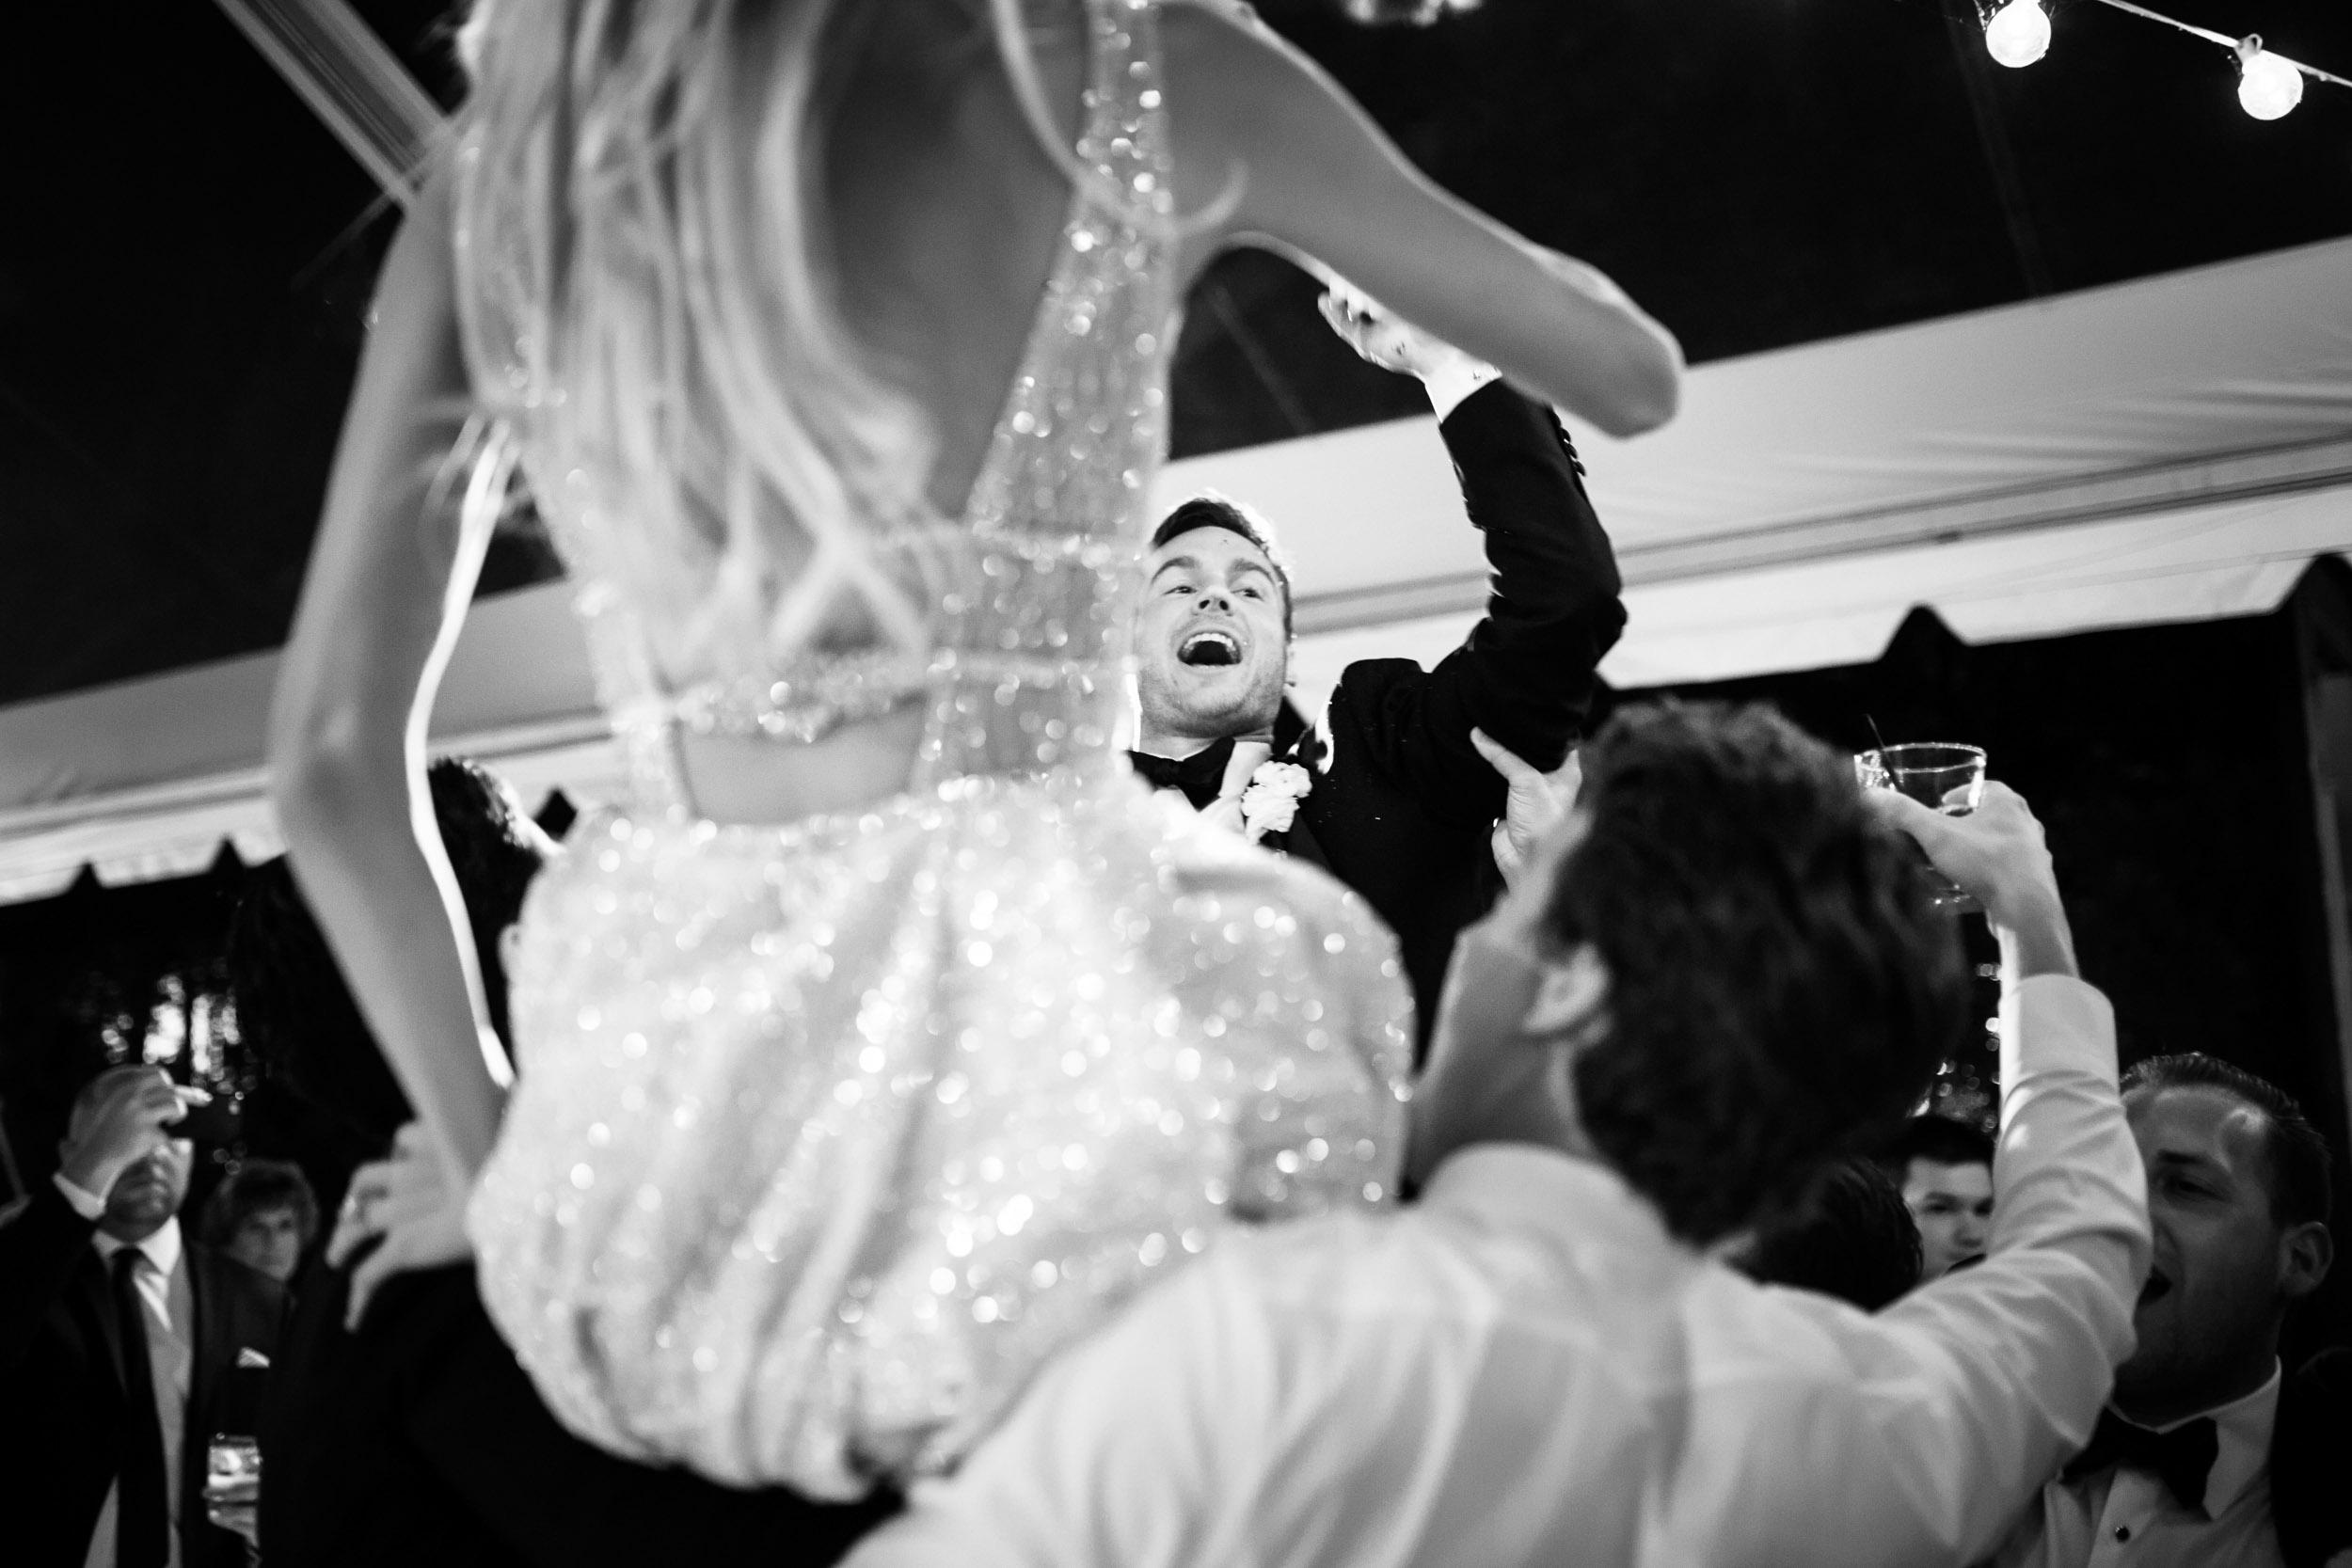 chicago-illuminating-co-wedding-photos-81.jpg